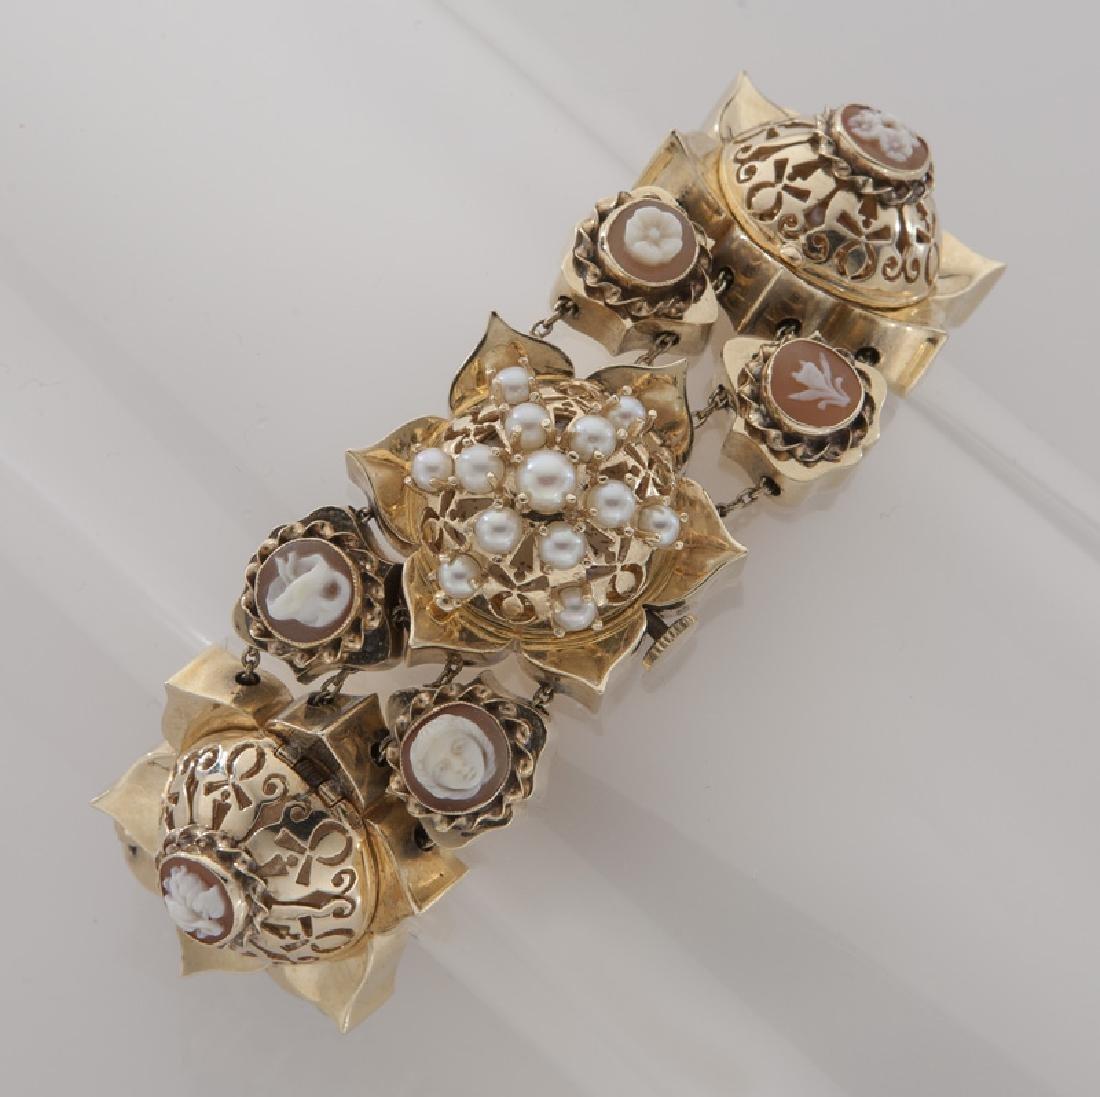 Retro 14K gold slide bracelet wristwatch